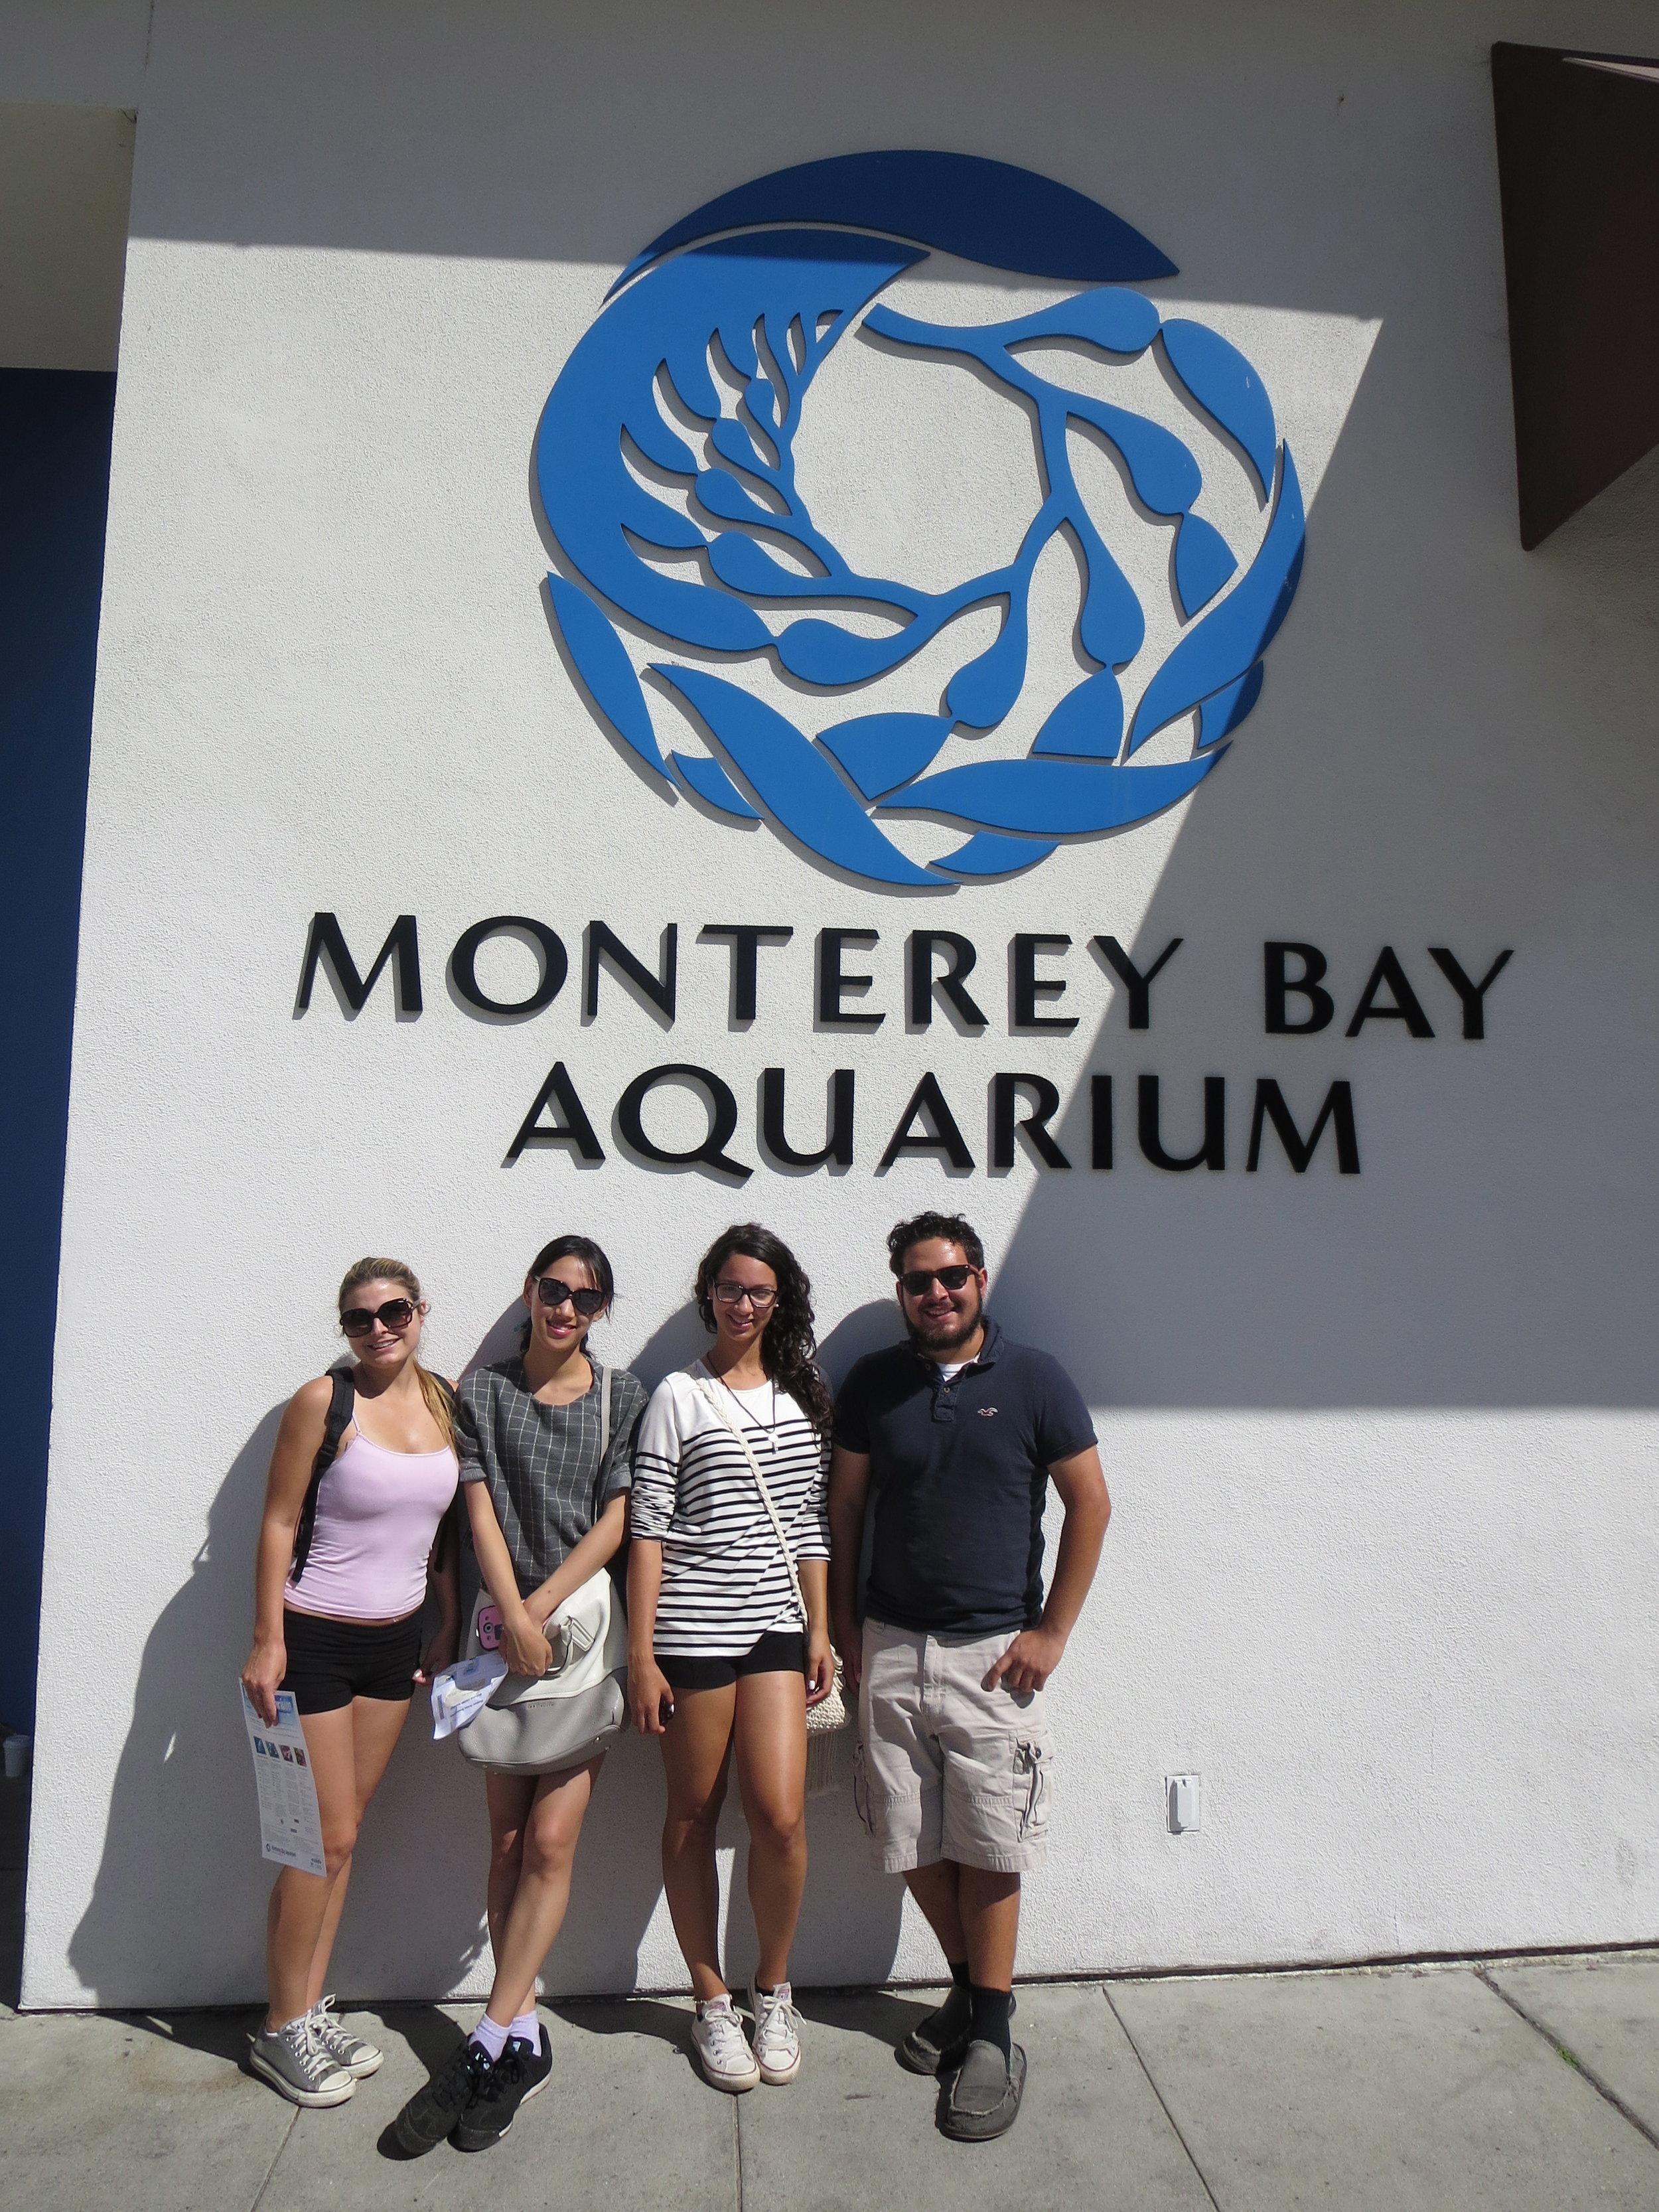 monterey bay aquarium, monterey, california.jpg